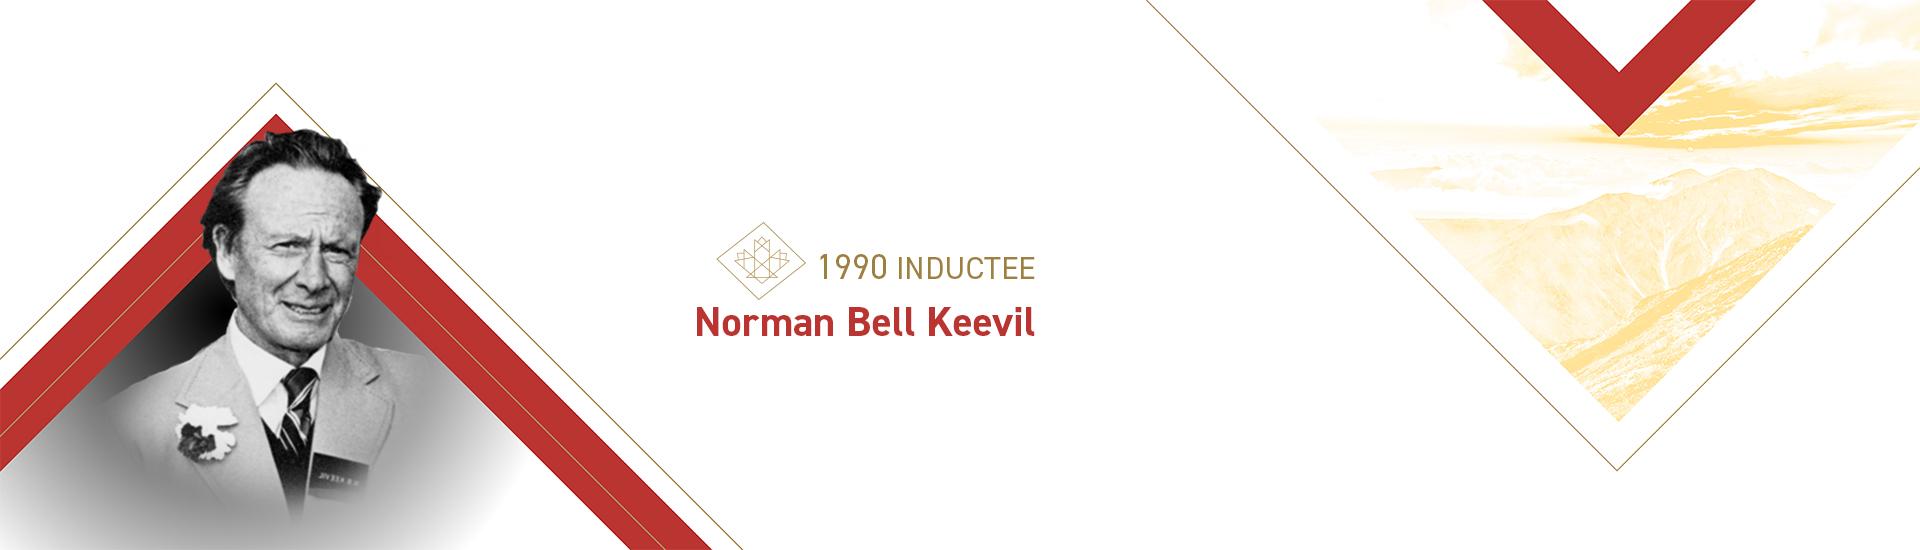 Norman Bell Keevil (1910 – 1989)